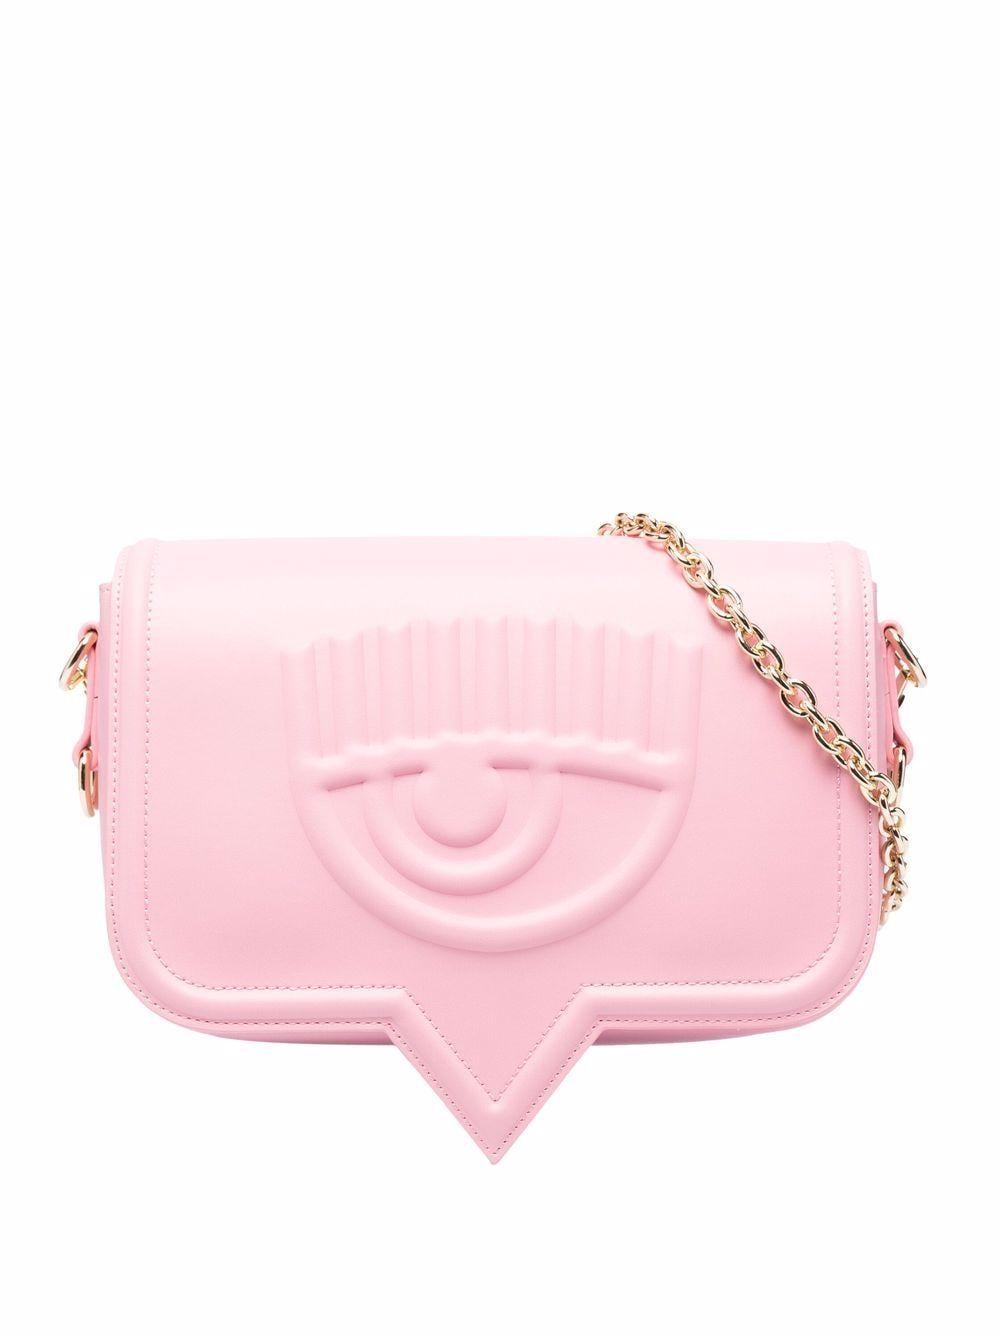 Chiara ferragni bags.. pink